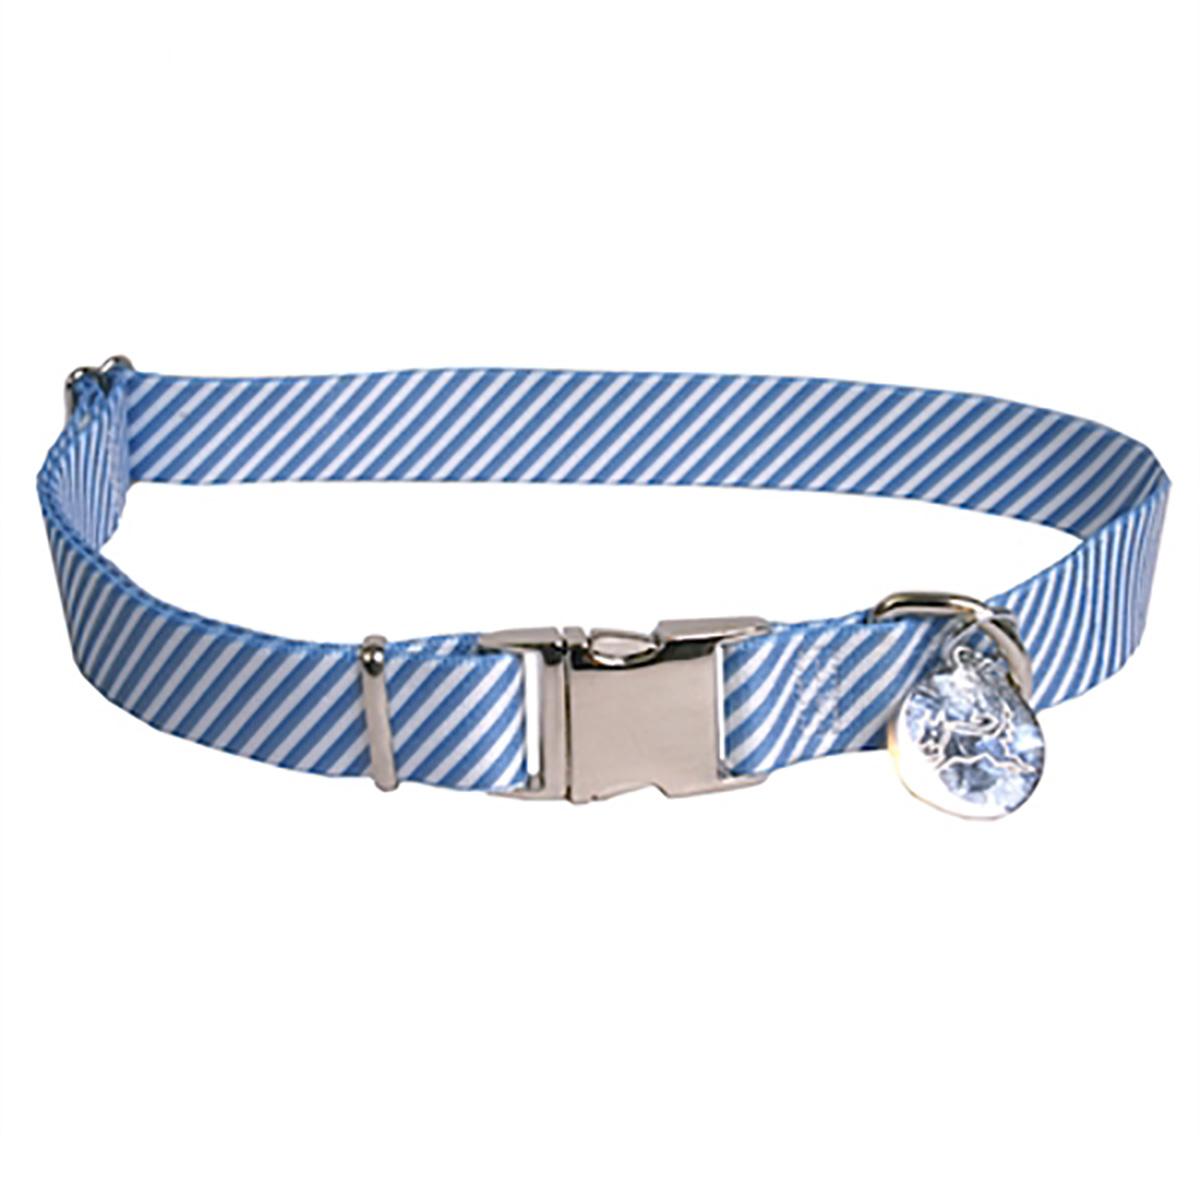 Southern Dawg Seersucker Dog Collar by Yellow Dog - Navy Blue